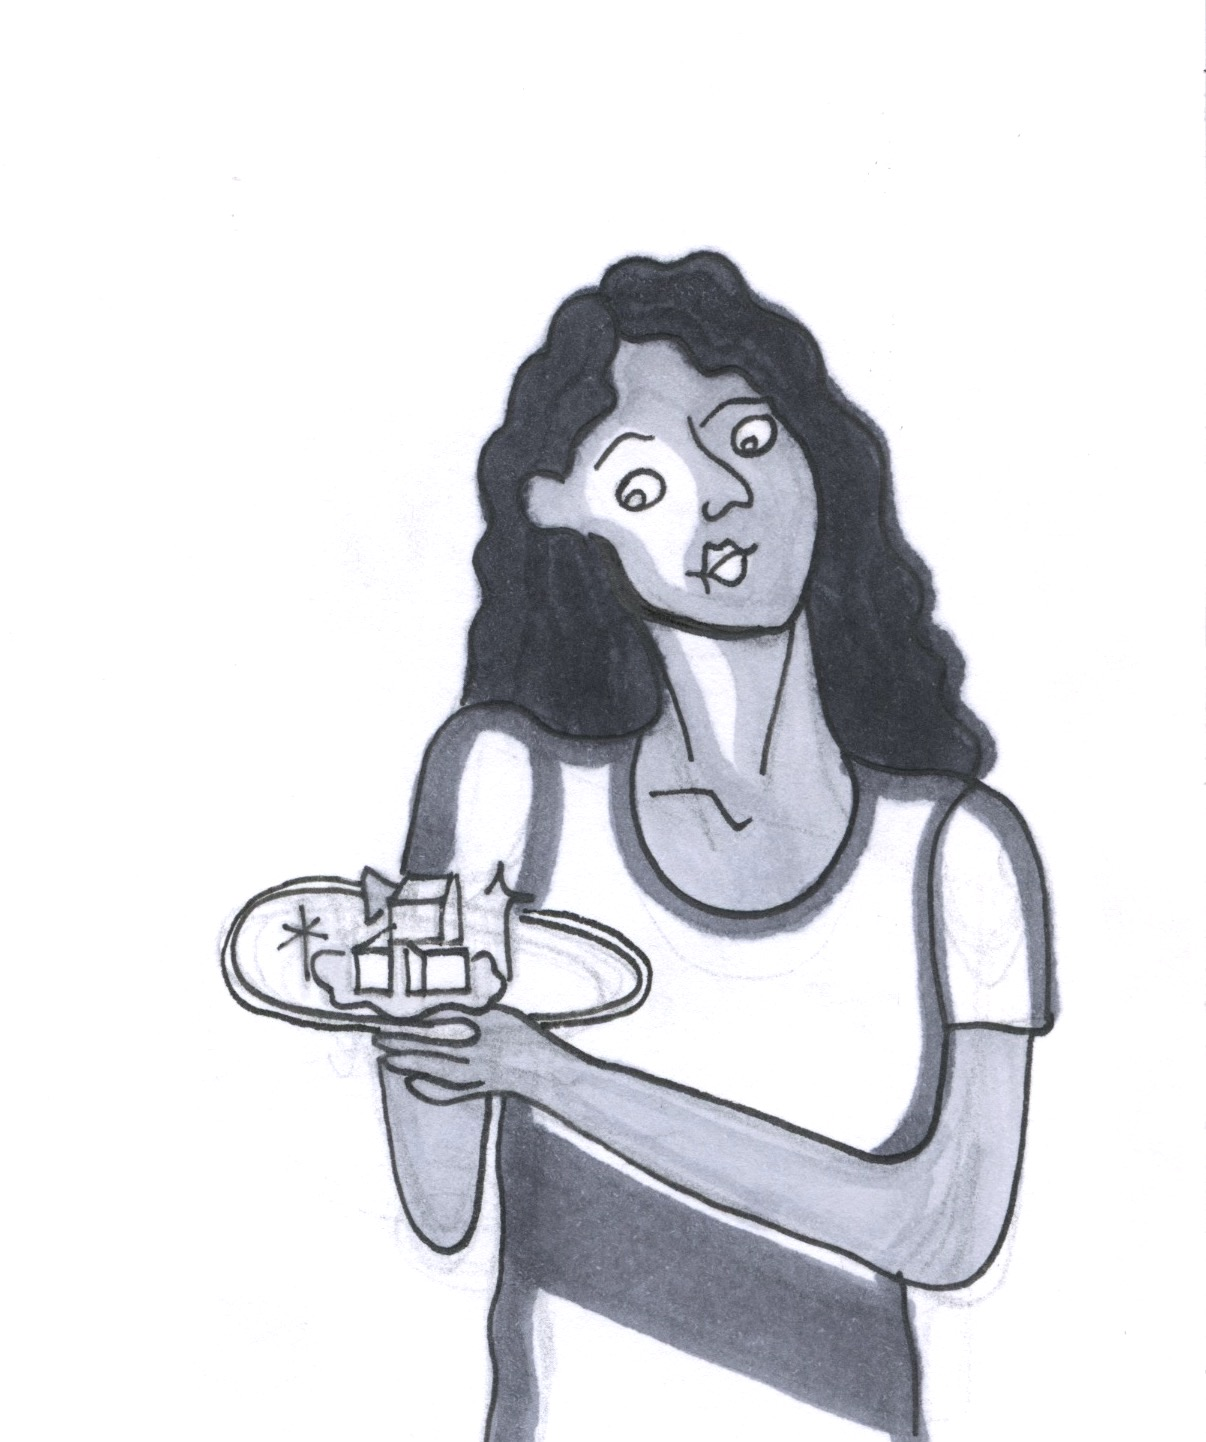 Illustration by Nathaly Perez